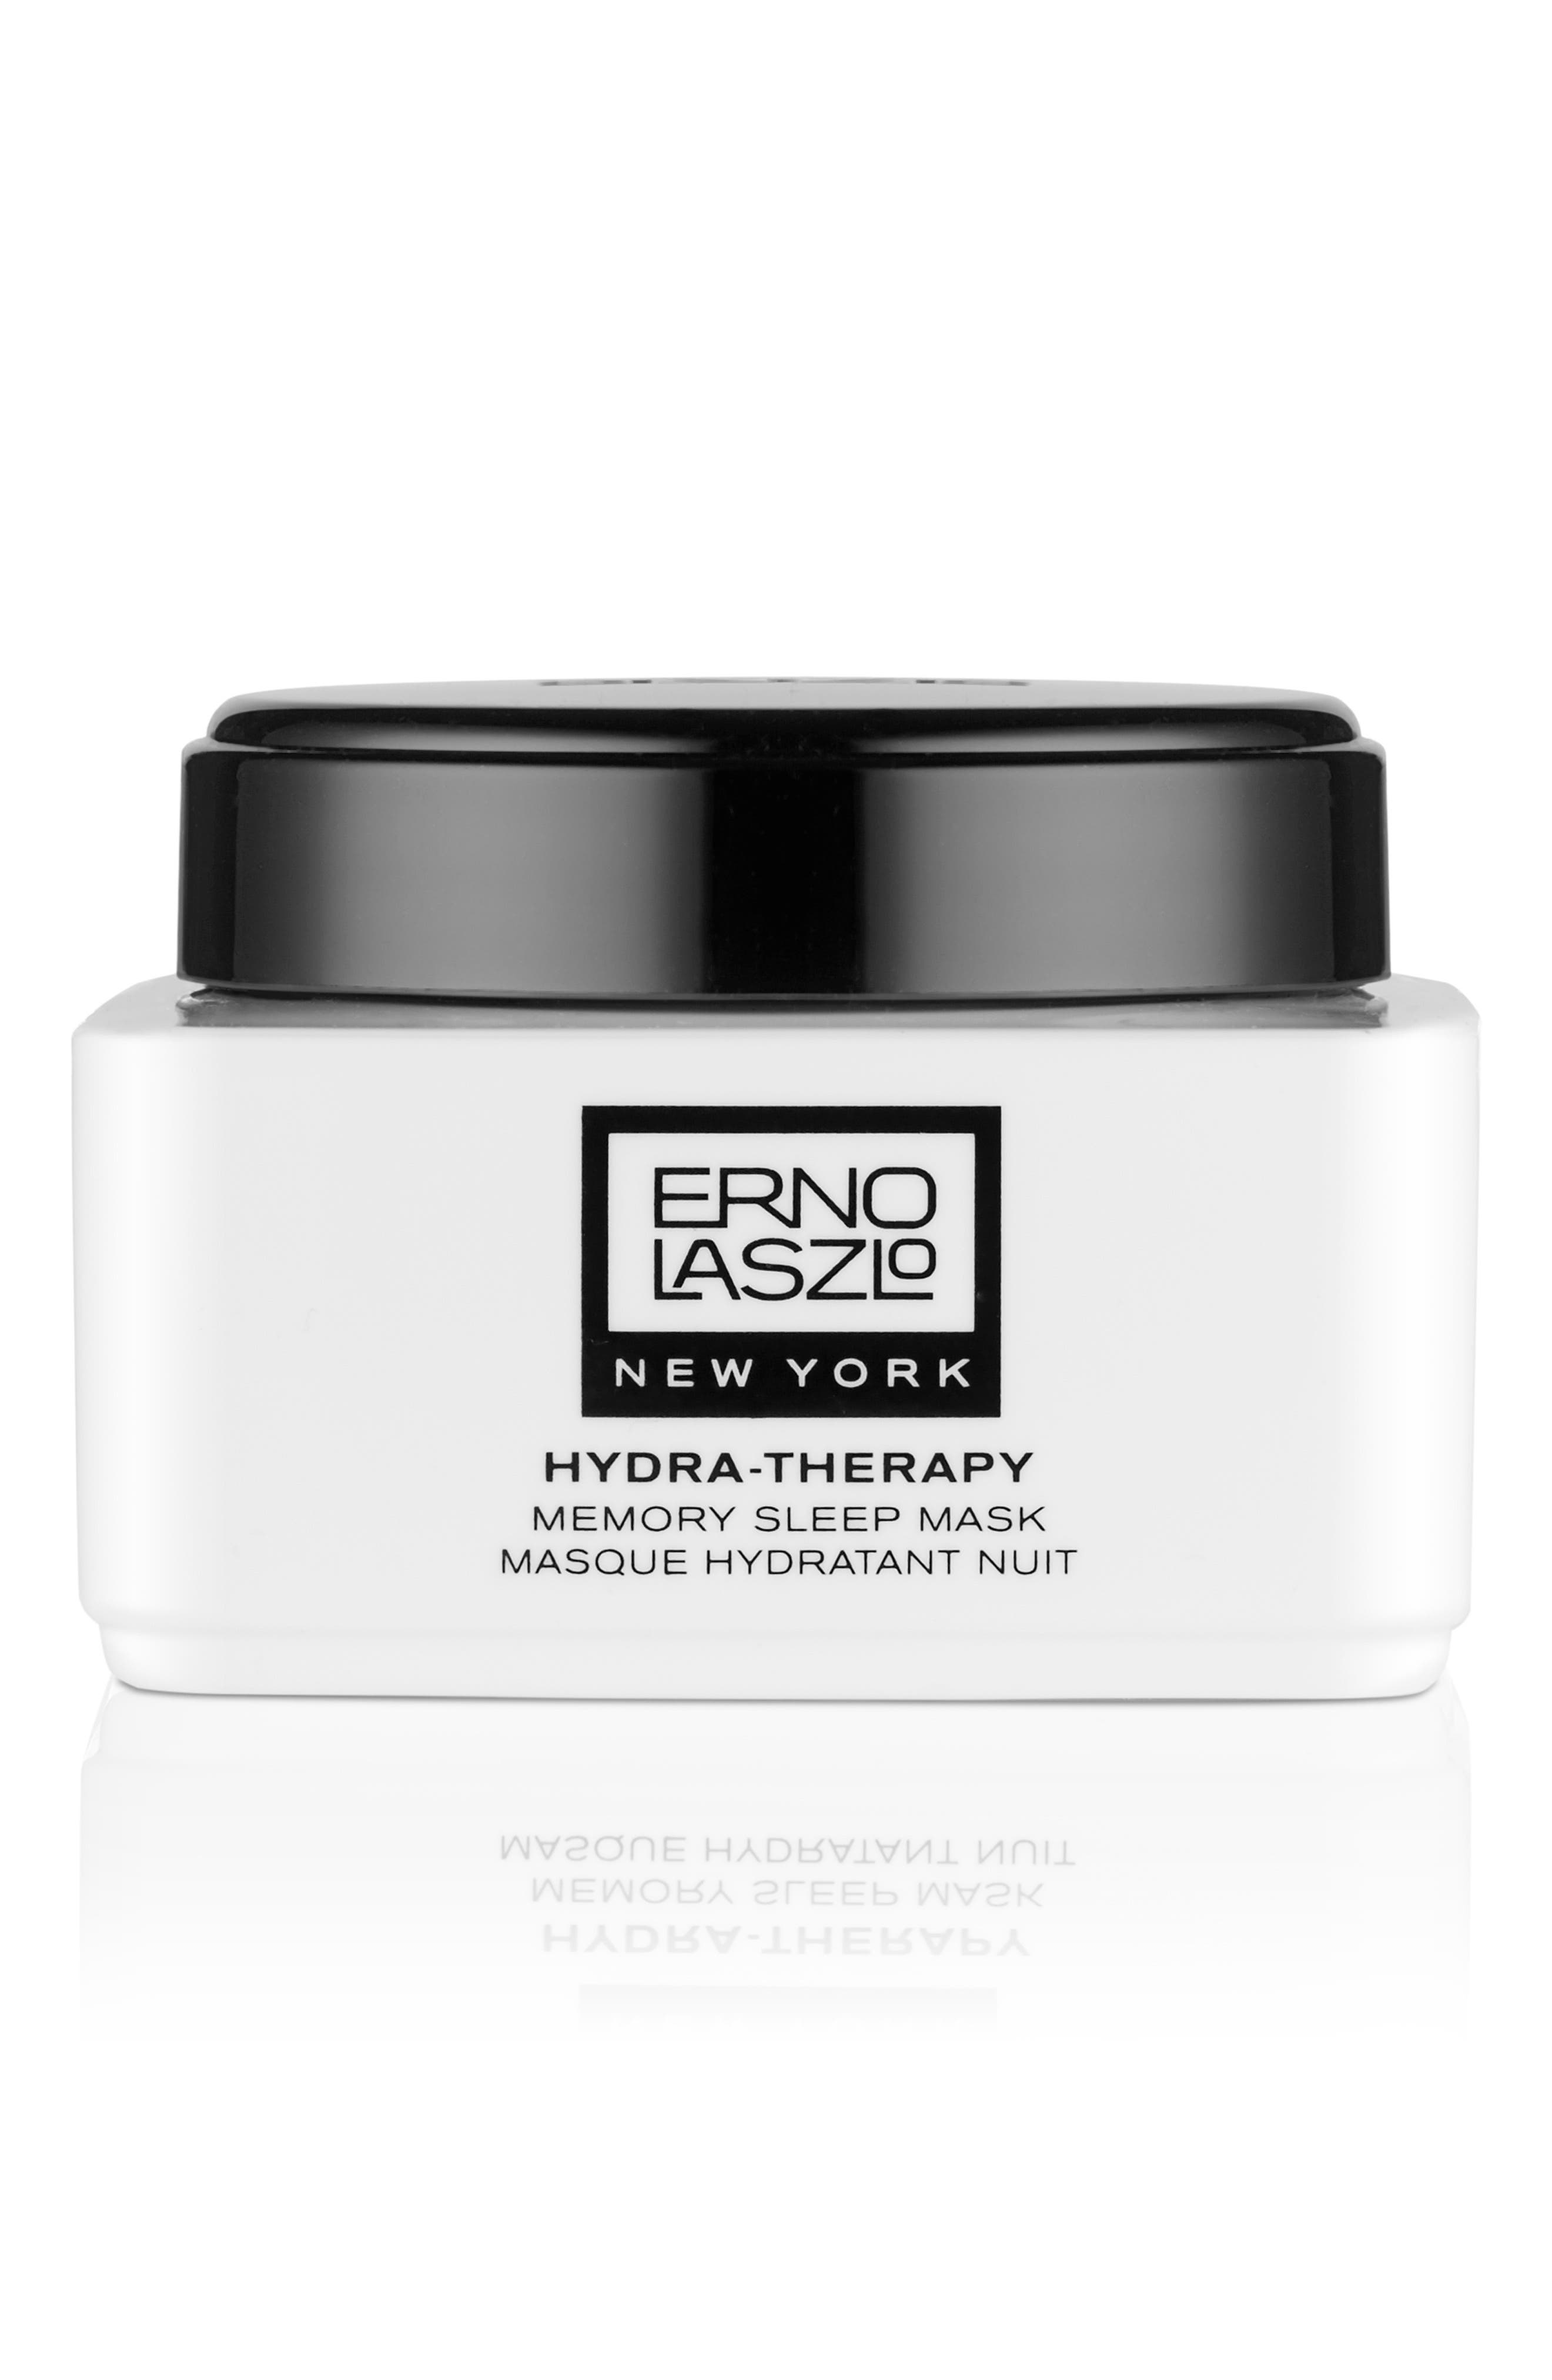 Hydra-Therapy Memory Sleep Mask